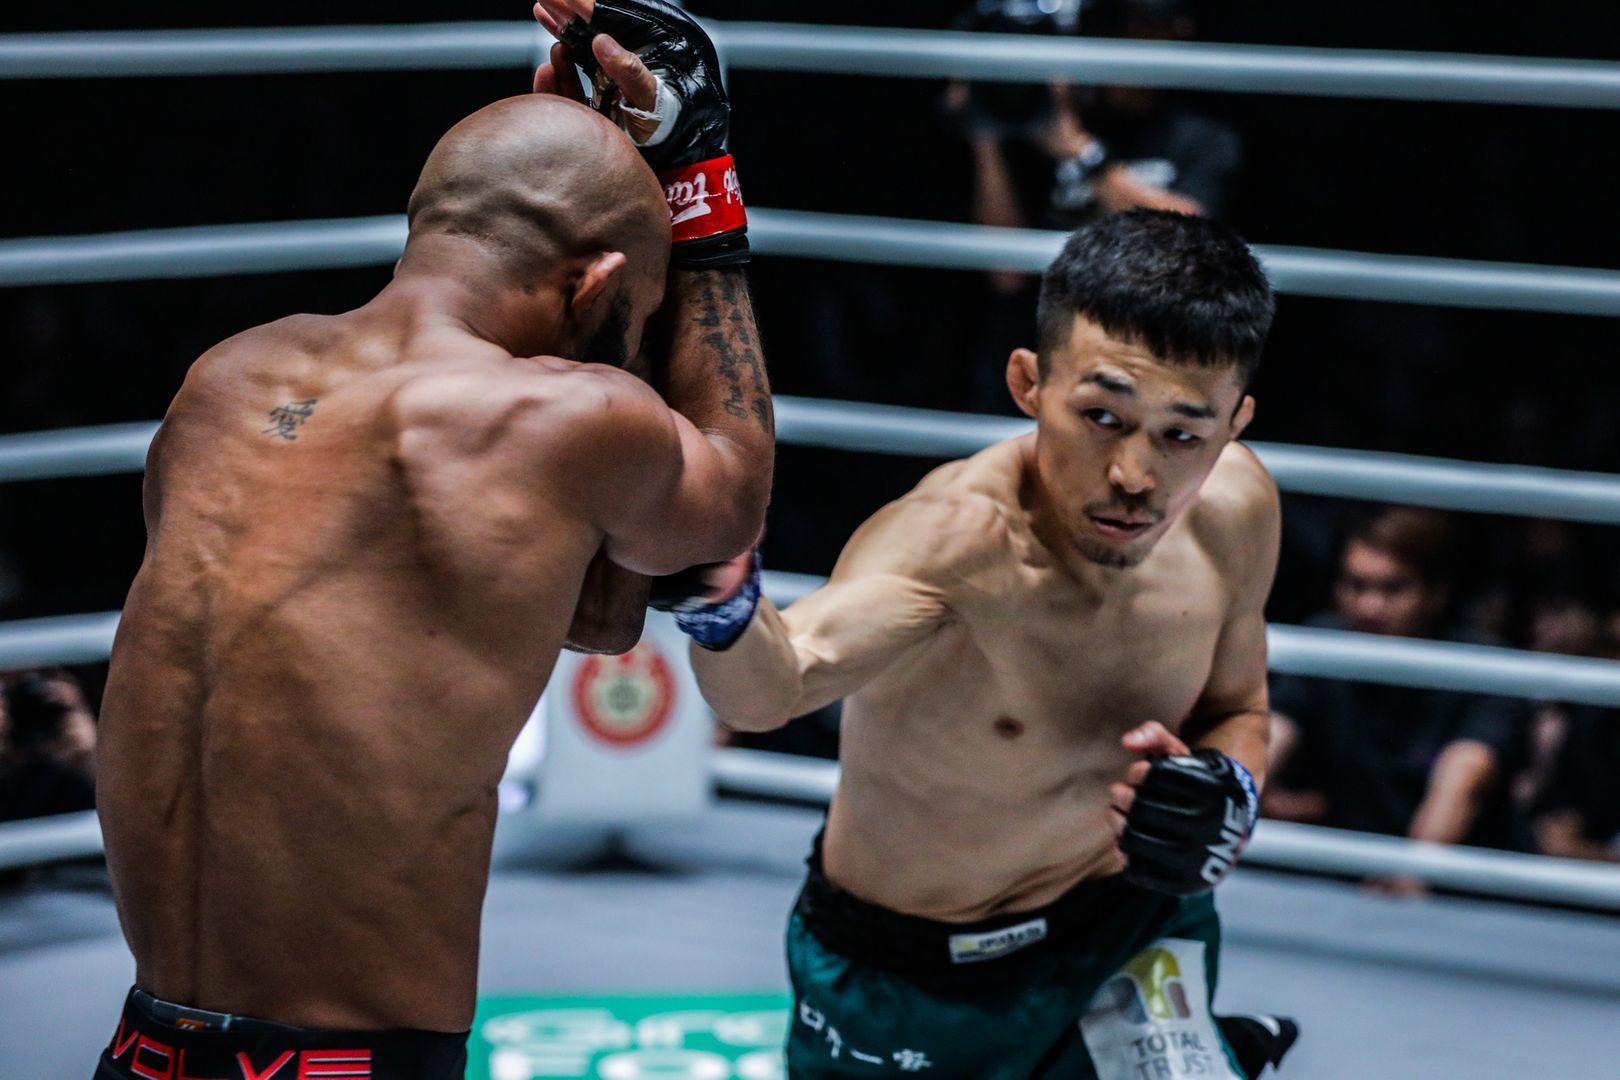 Japanese flyweight Tatsumitsu Wada punches Demetrious Johnson